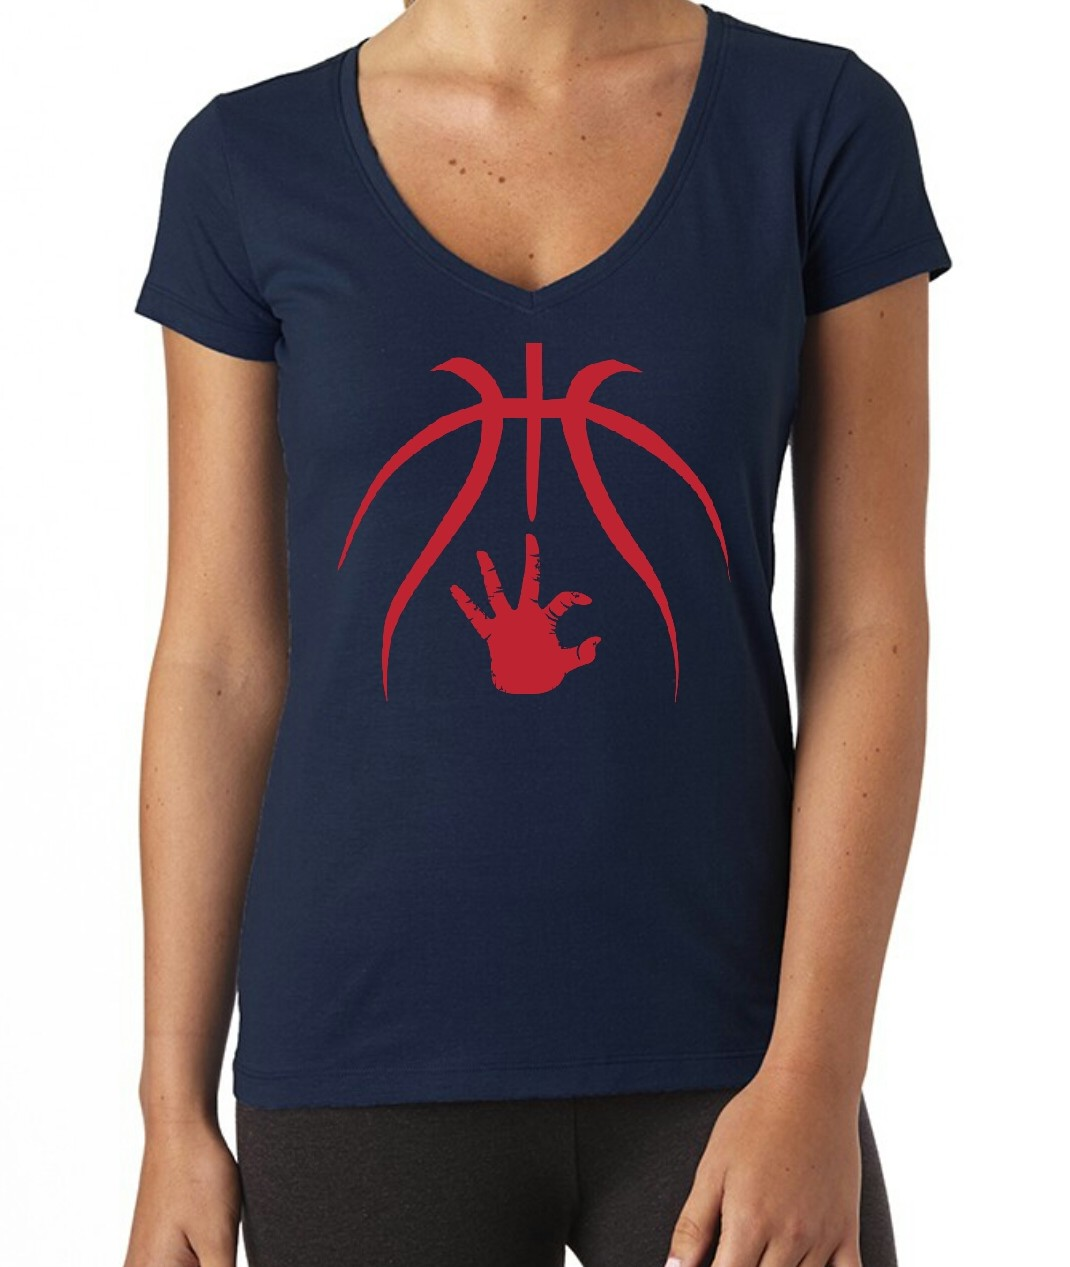 womens Navy basketball/wc